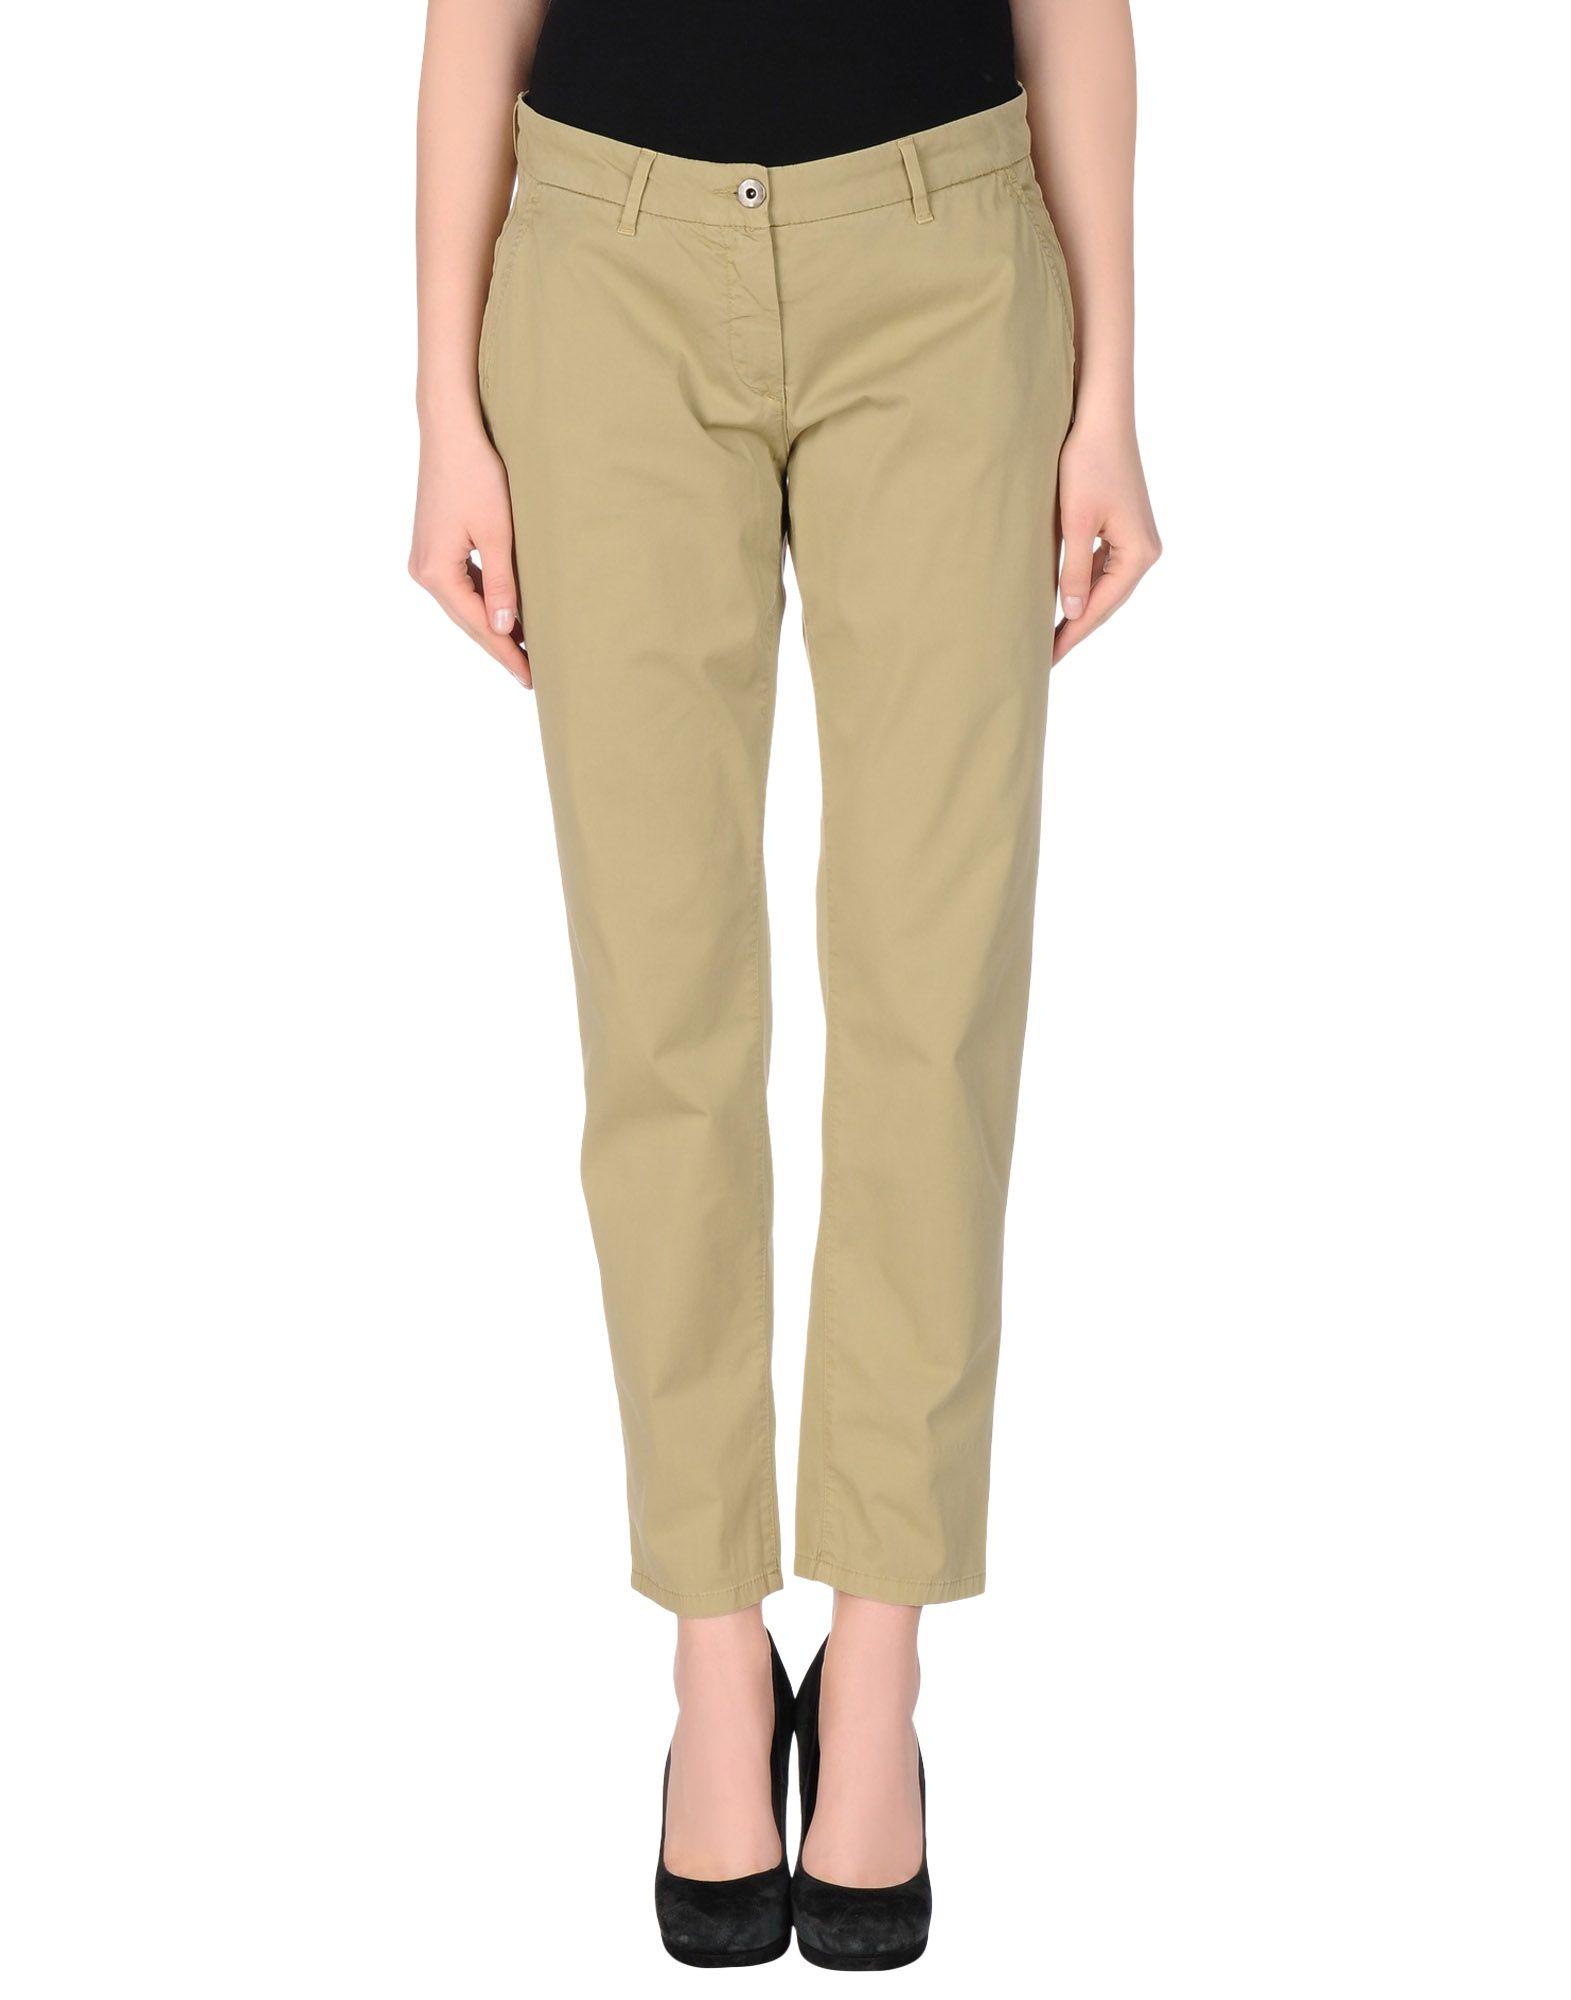 PATRIZIA PEPE Повседневные брюки patrizia pepe джинсы чинос